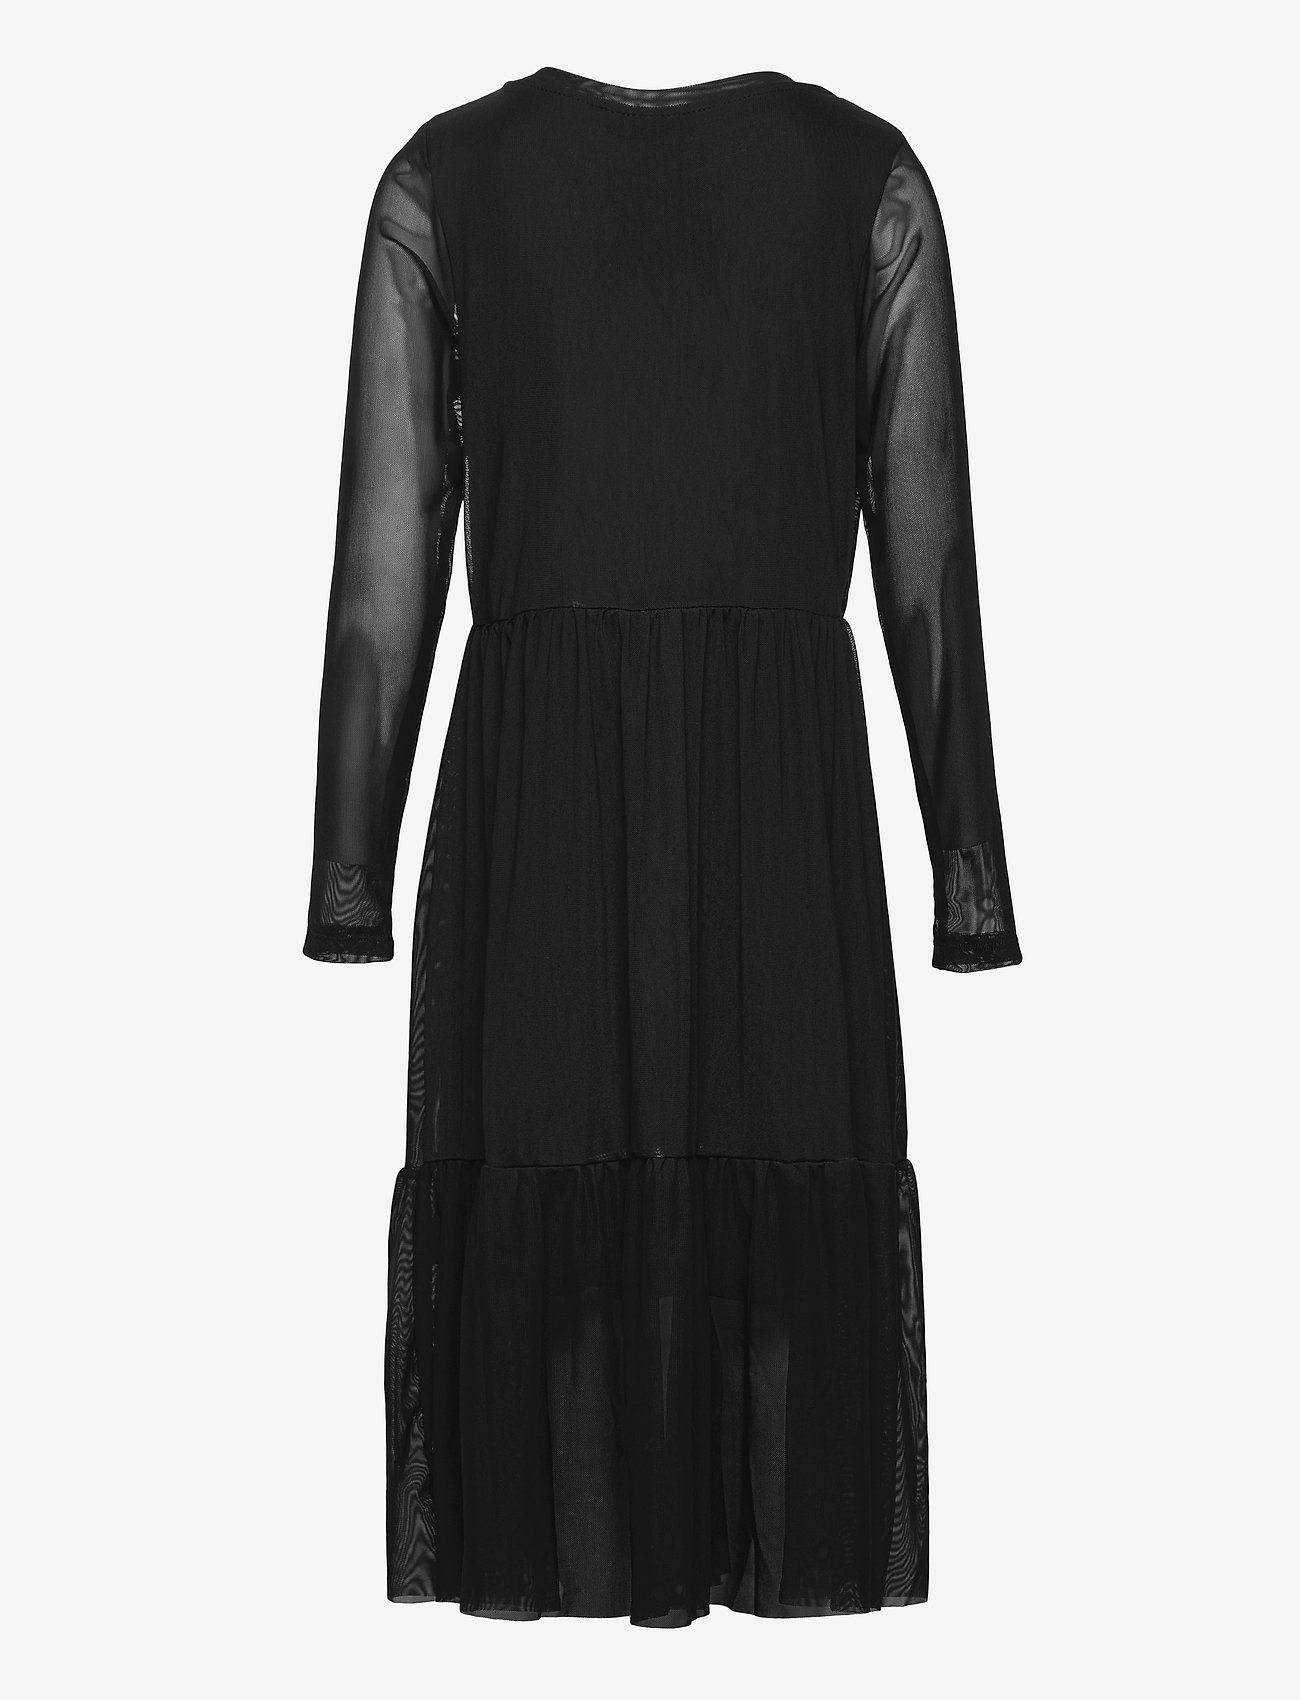 LMTD - NLFRESH LS DRESS - kleider - black - 1